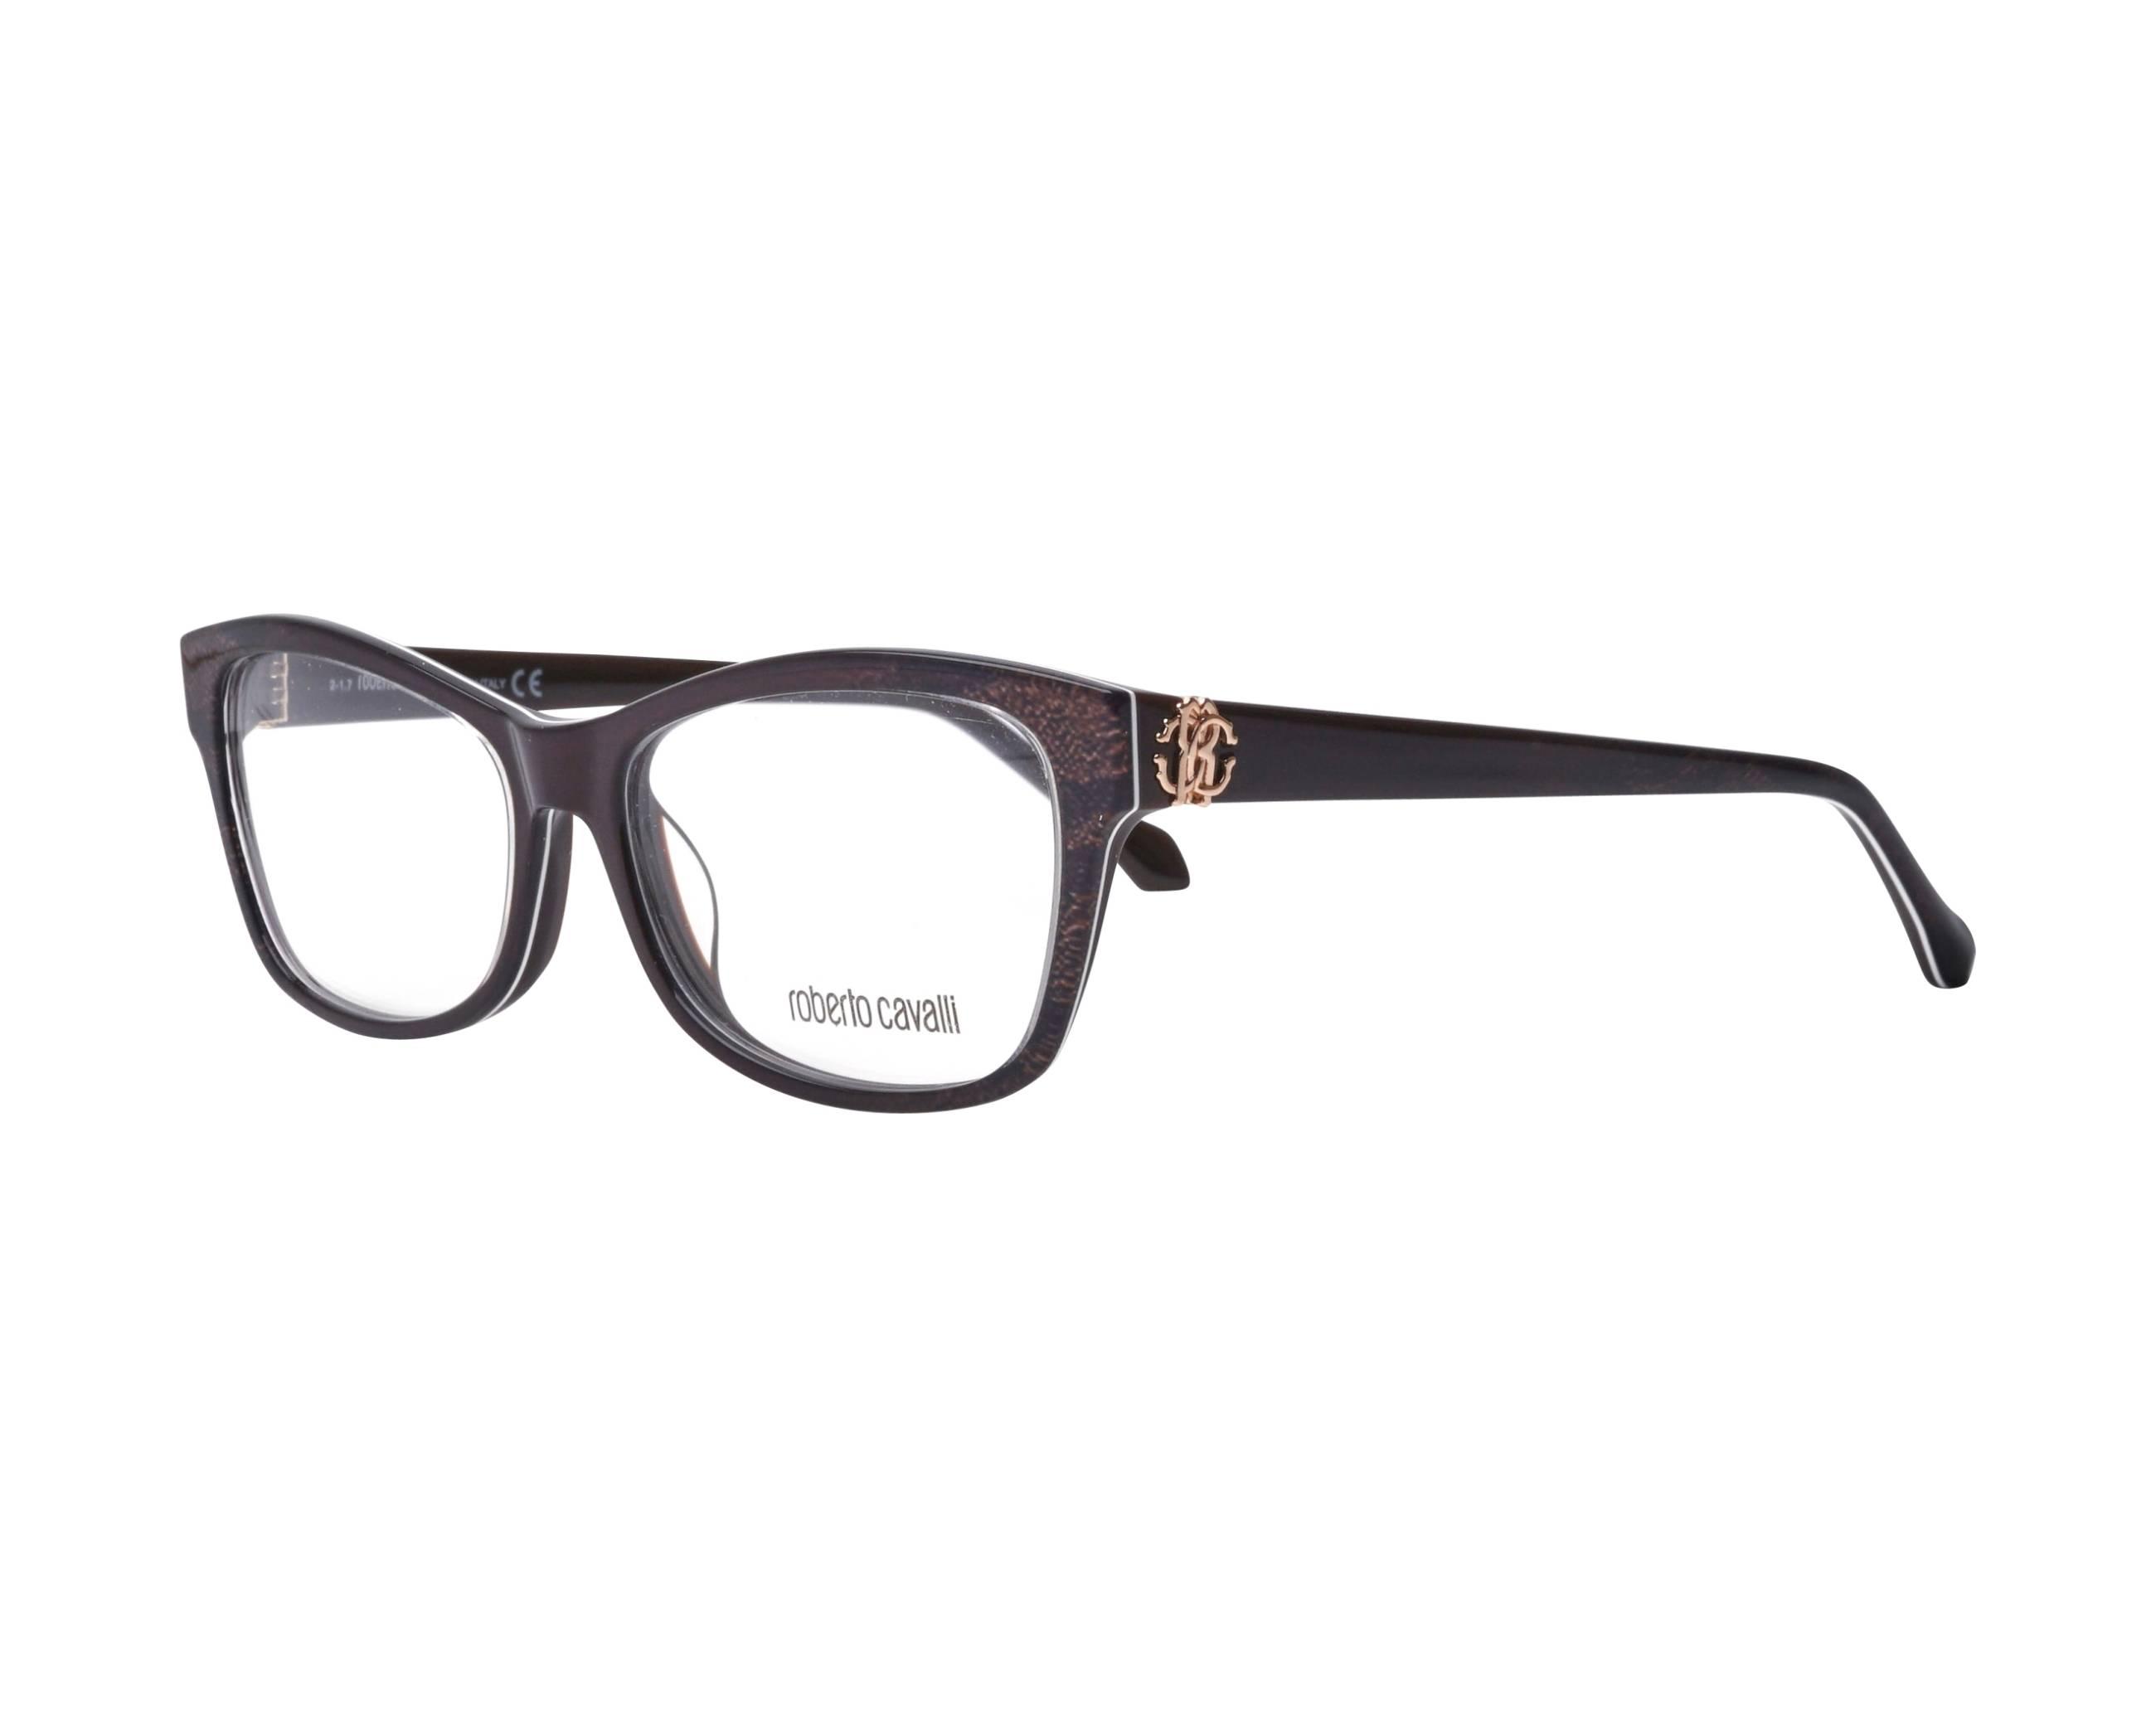 2c65e787f5 eyeglasses Roberto Cavalli RC-5013 050 54-15 Brown Brown profile view